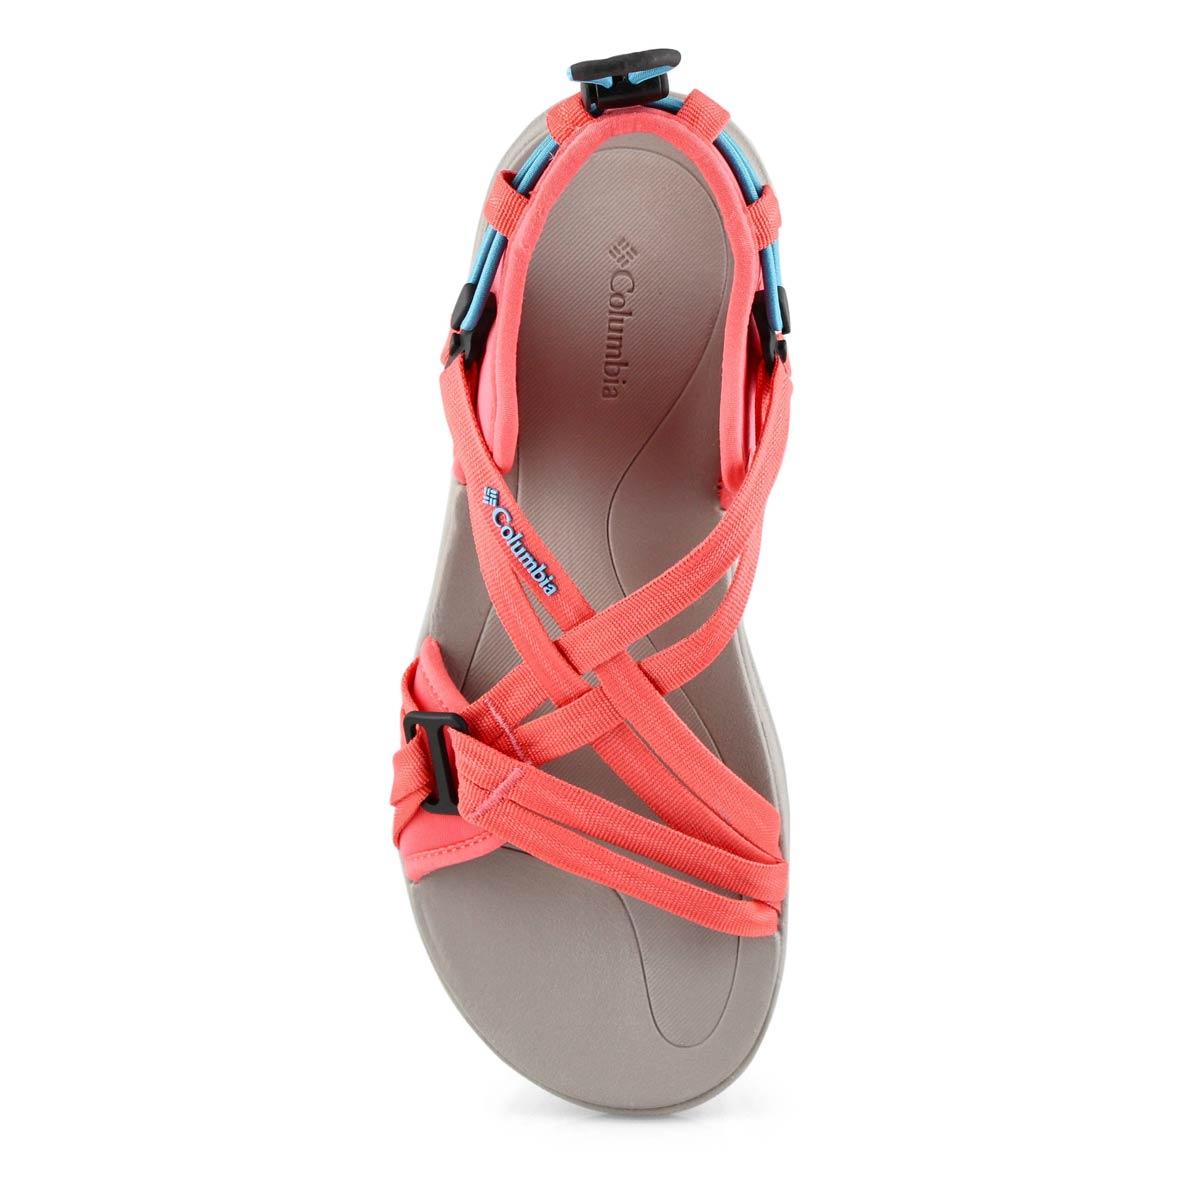 Lds Columbia Sandal juicy sport sandal